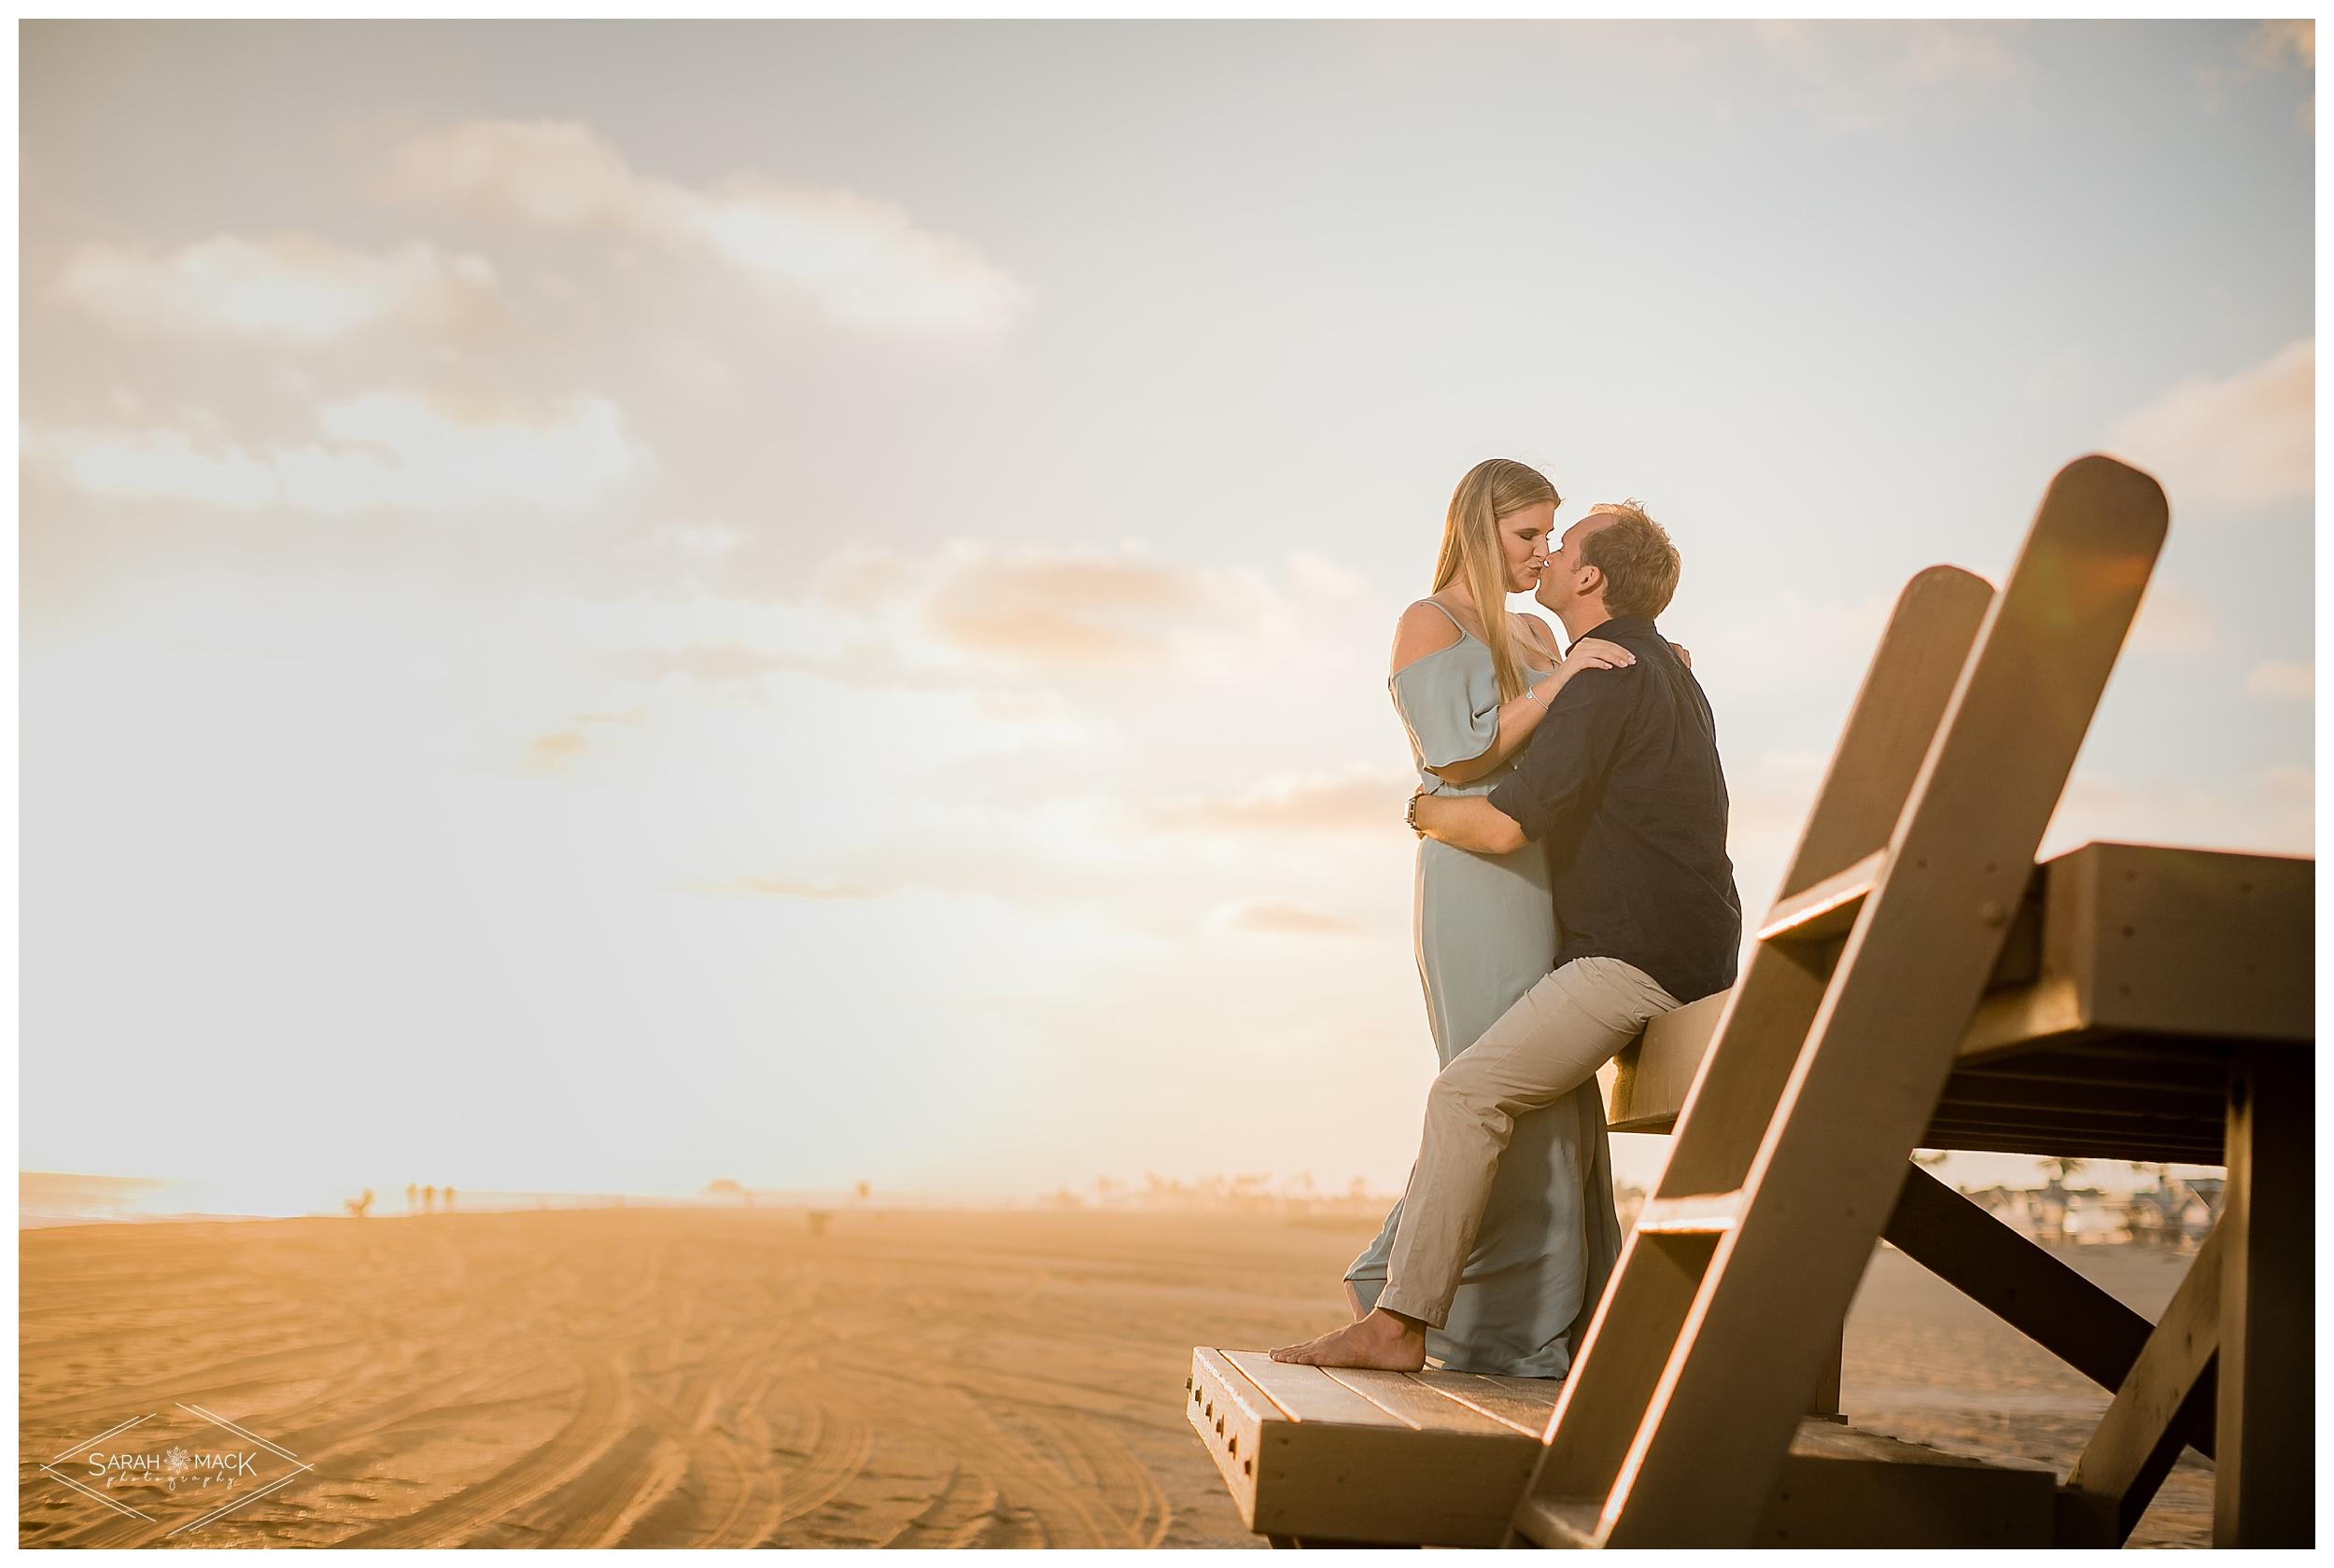 HI_Balboa_Island_Newport-Beach-Engagement-Photography-028.jpg